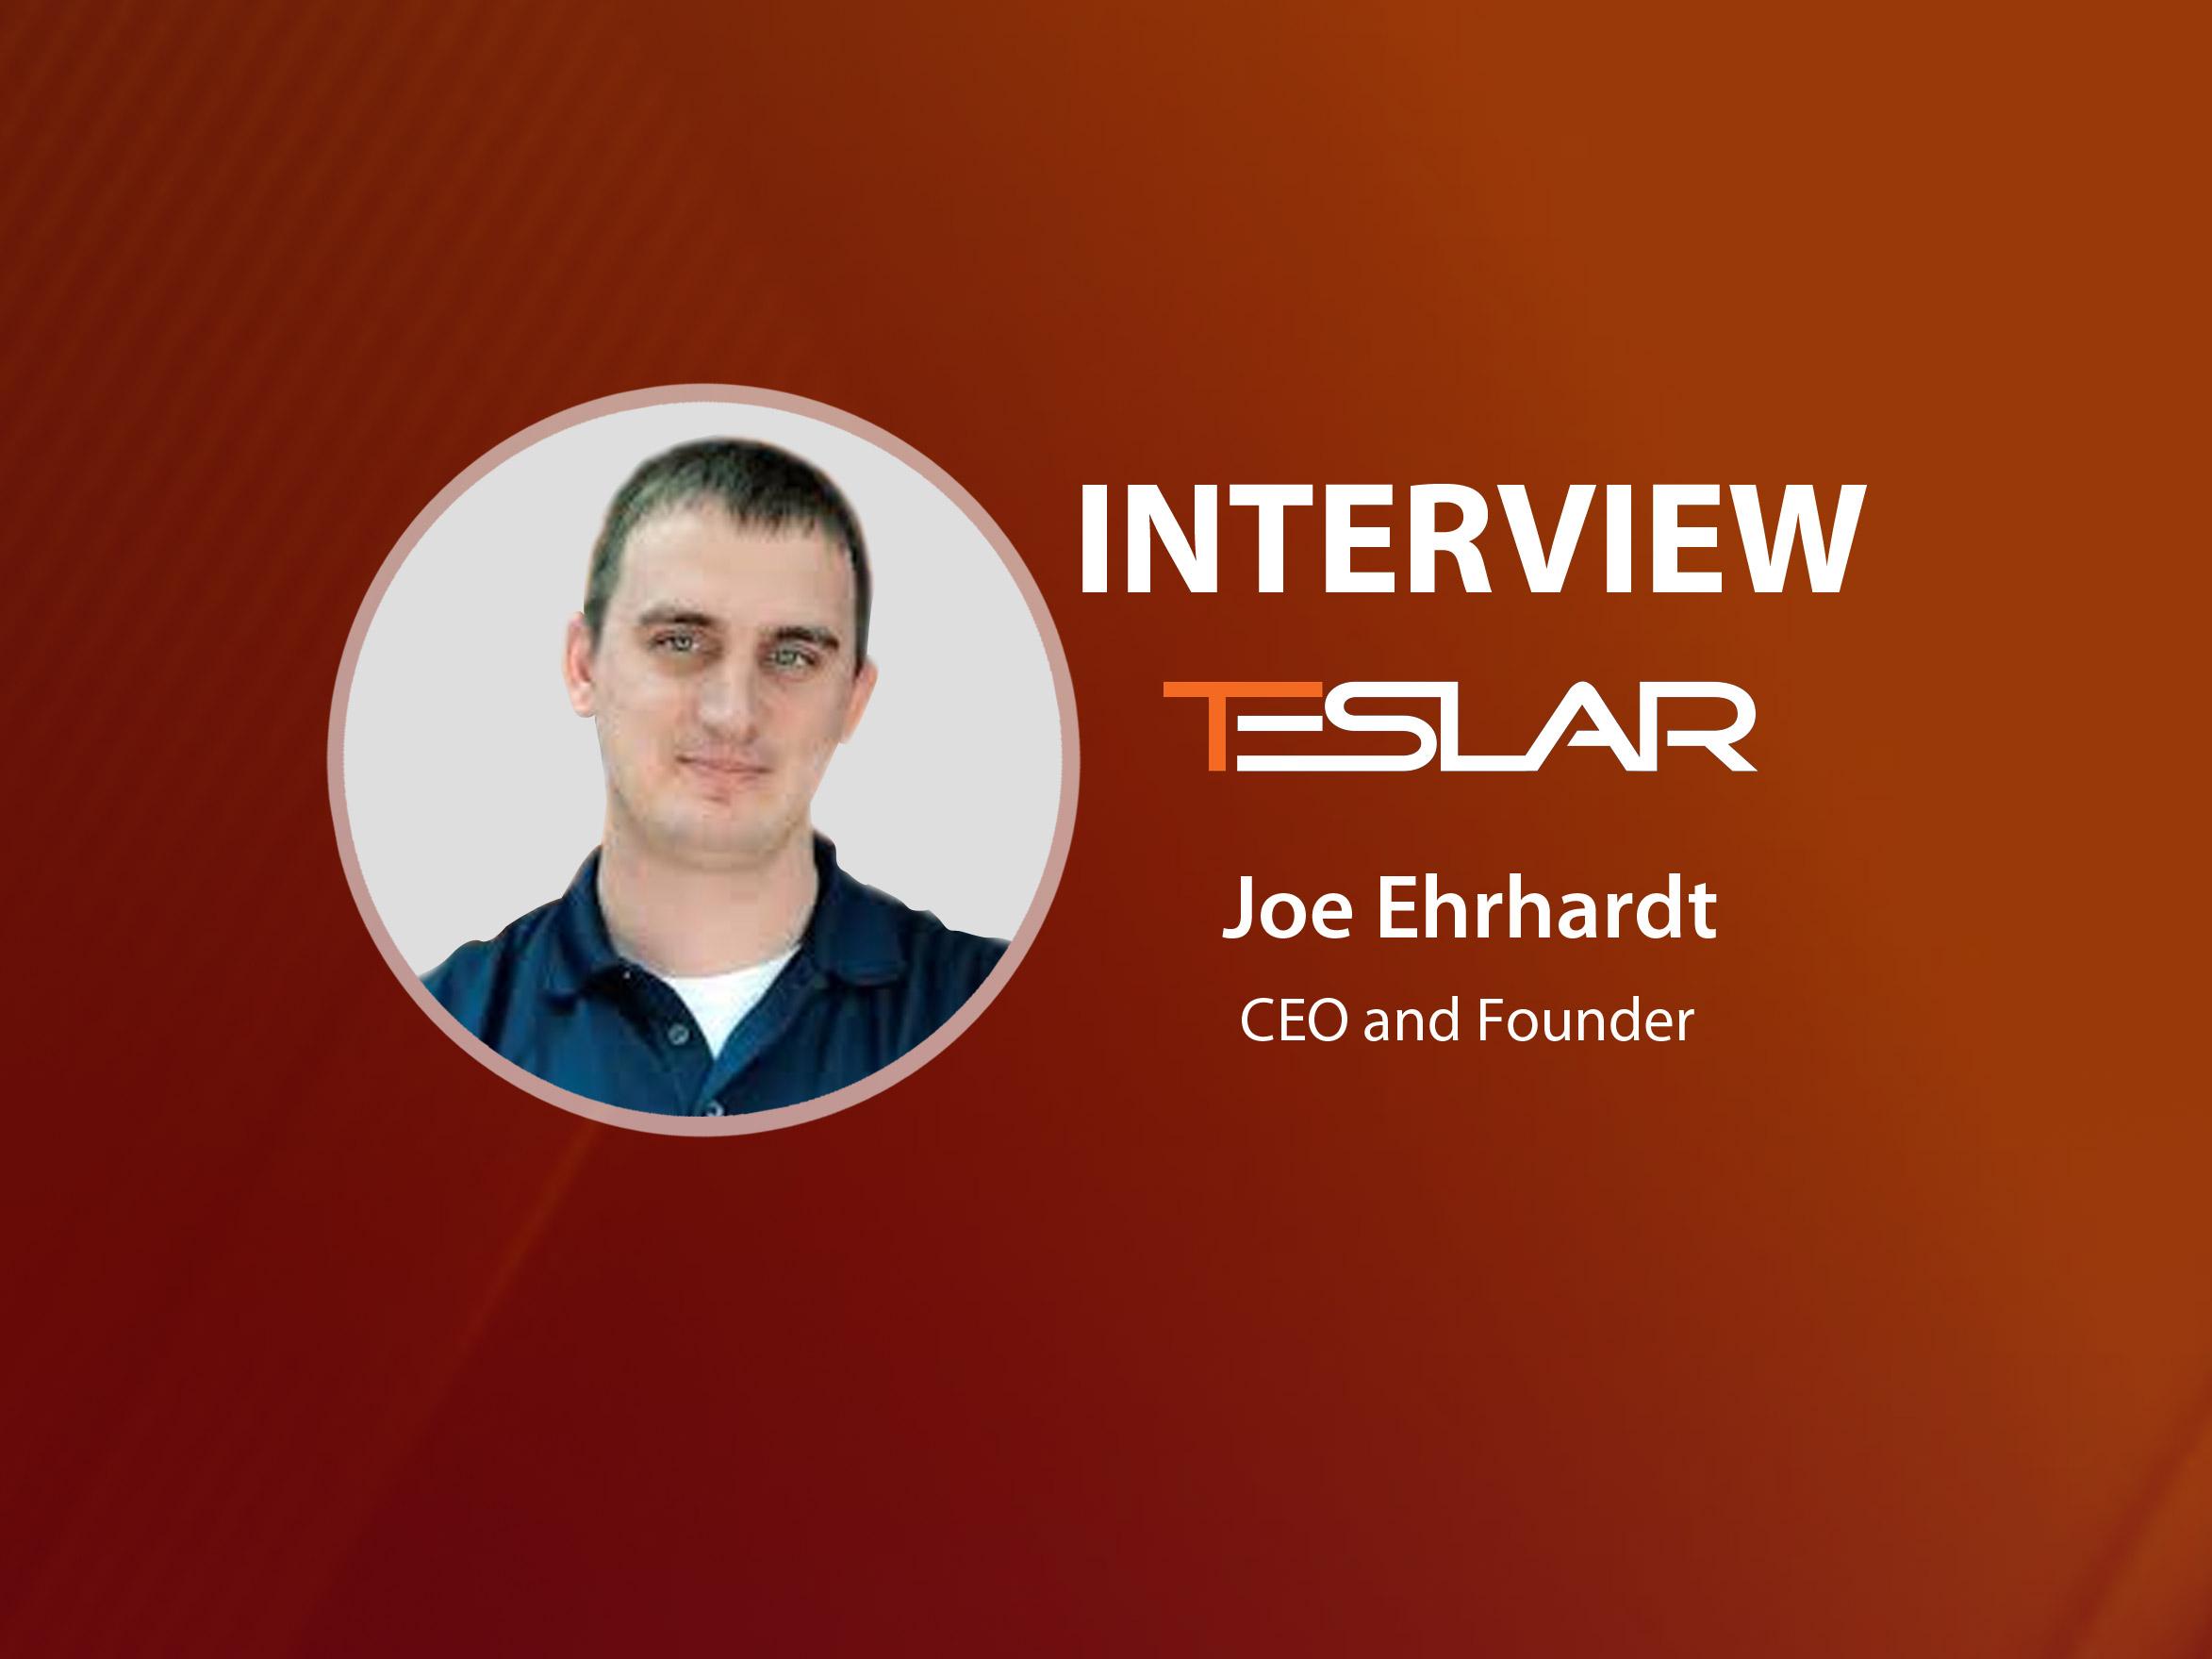 GlobalFintechSeries Interview with Joe Ehrhardt, CEO & Founder at Teslar Software